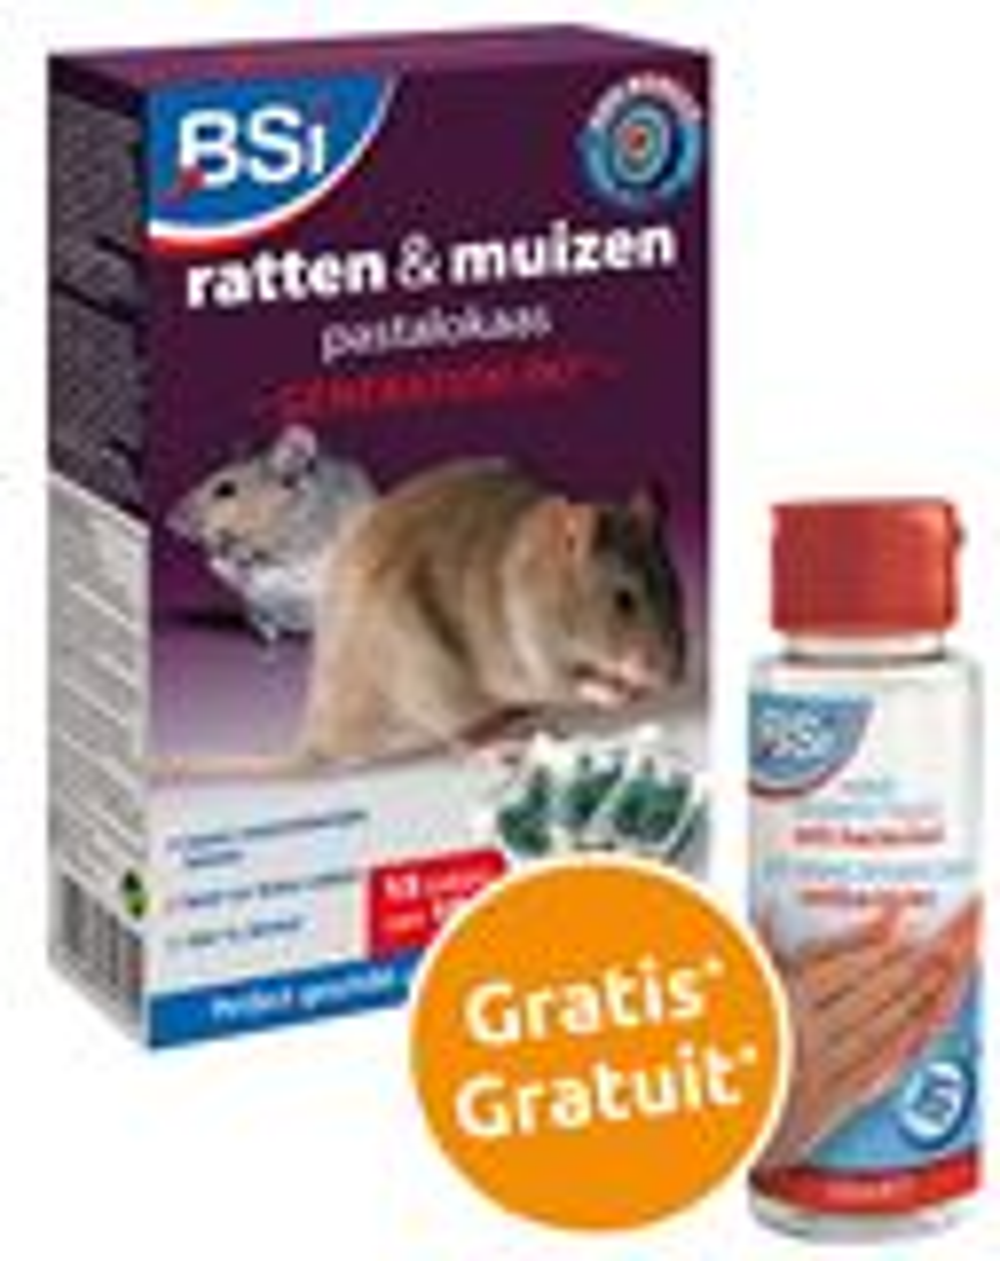 Generation Pat 150 gram: muizen- en rattenvergif